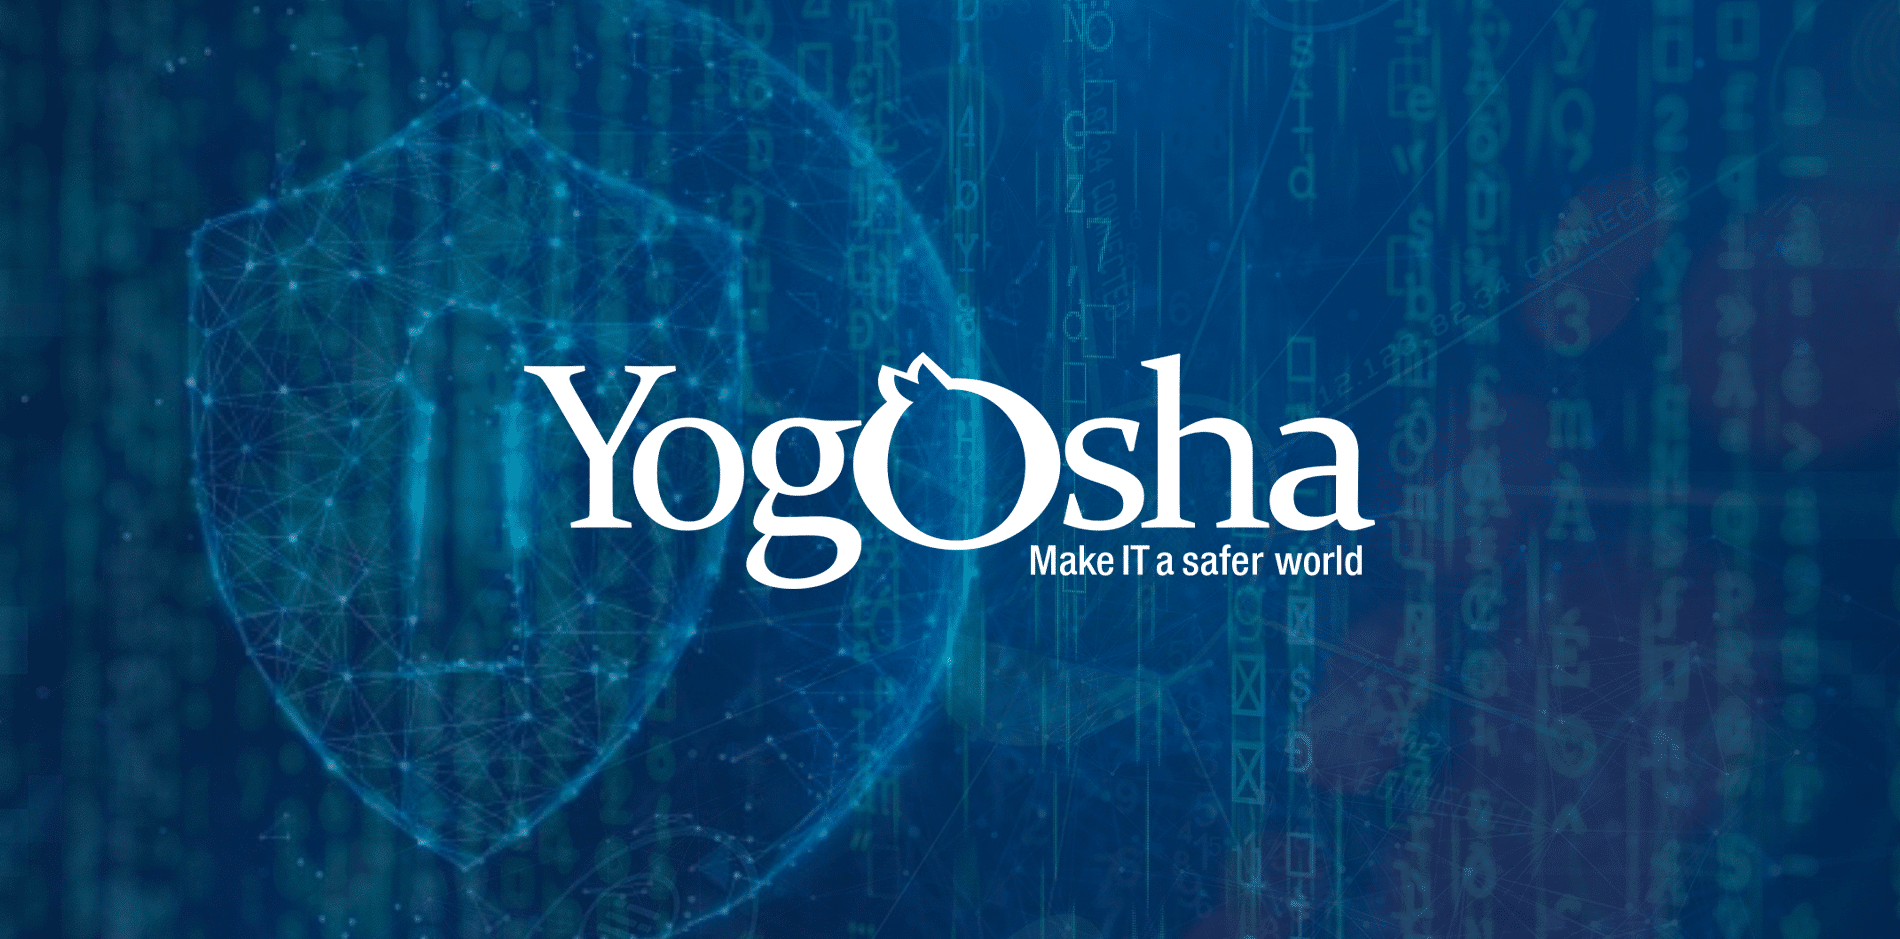 Trustpair x Yogosha – Cybersécurité